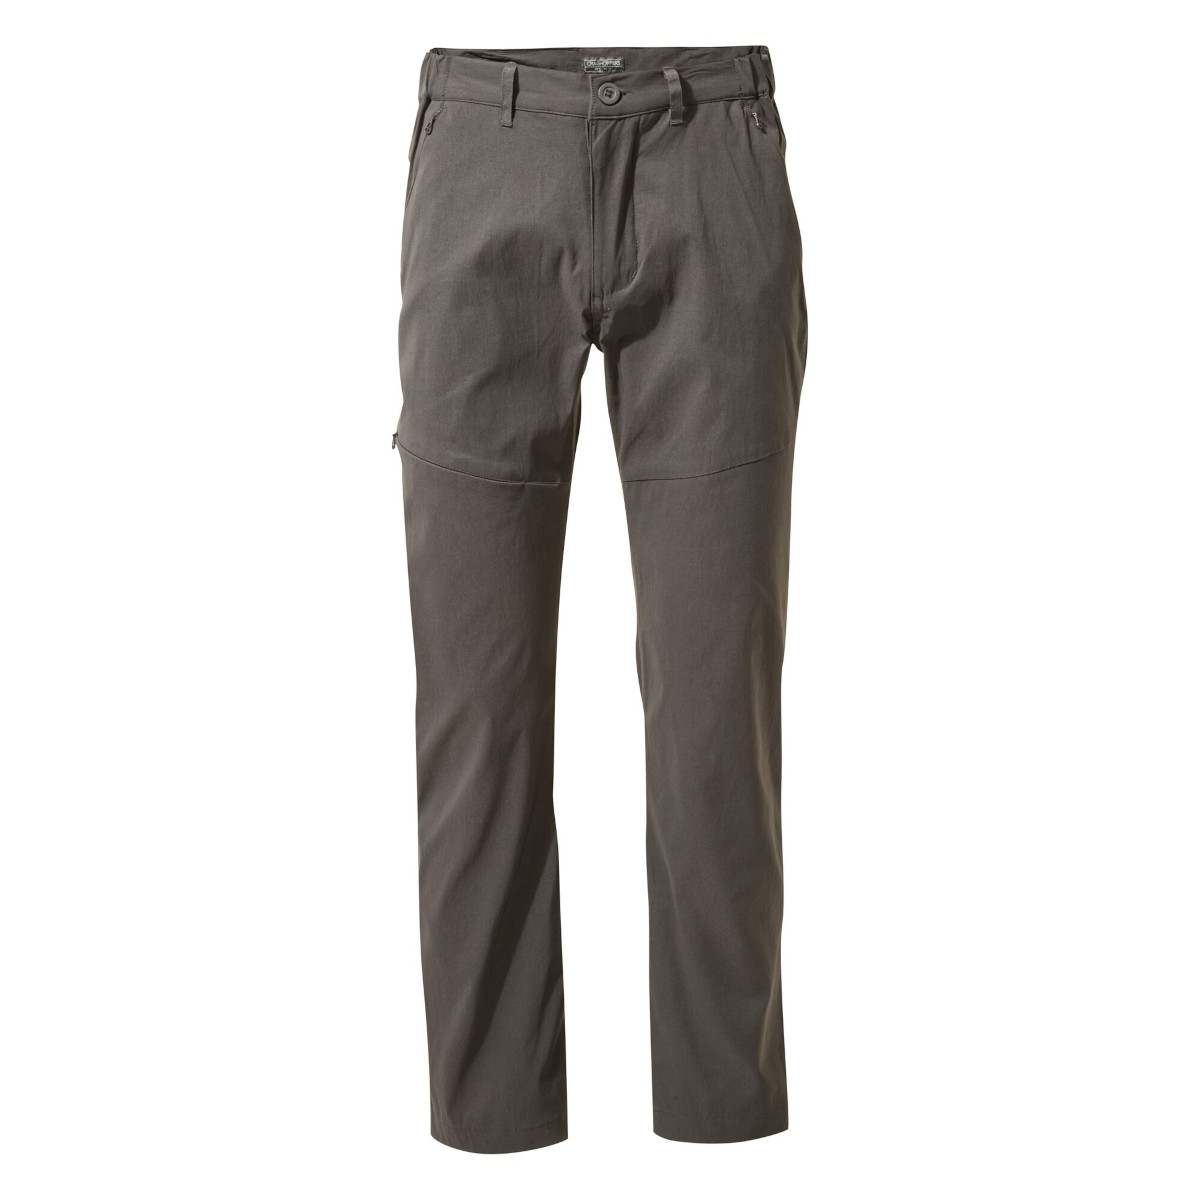 Craghoppers Kiwi Pro II Trousers - Dark Lead